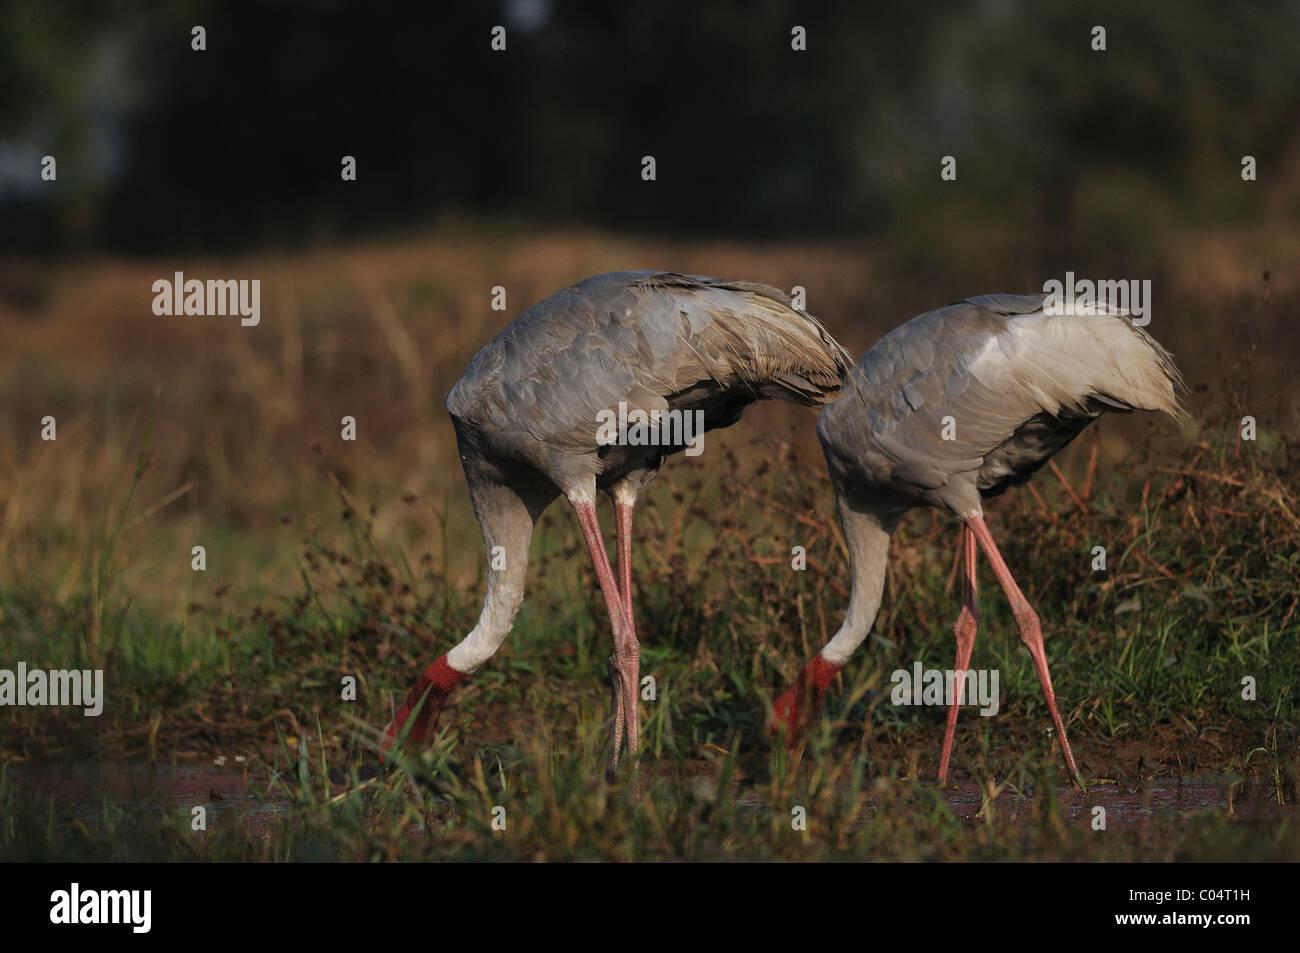 Sarus Crane couple feeding in Keoladeo Ghana National Park, Bharatpur, India - Stock Image